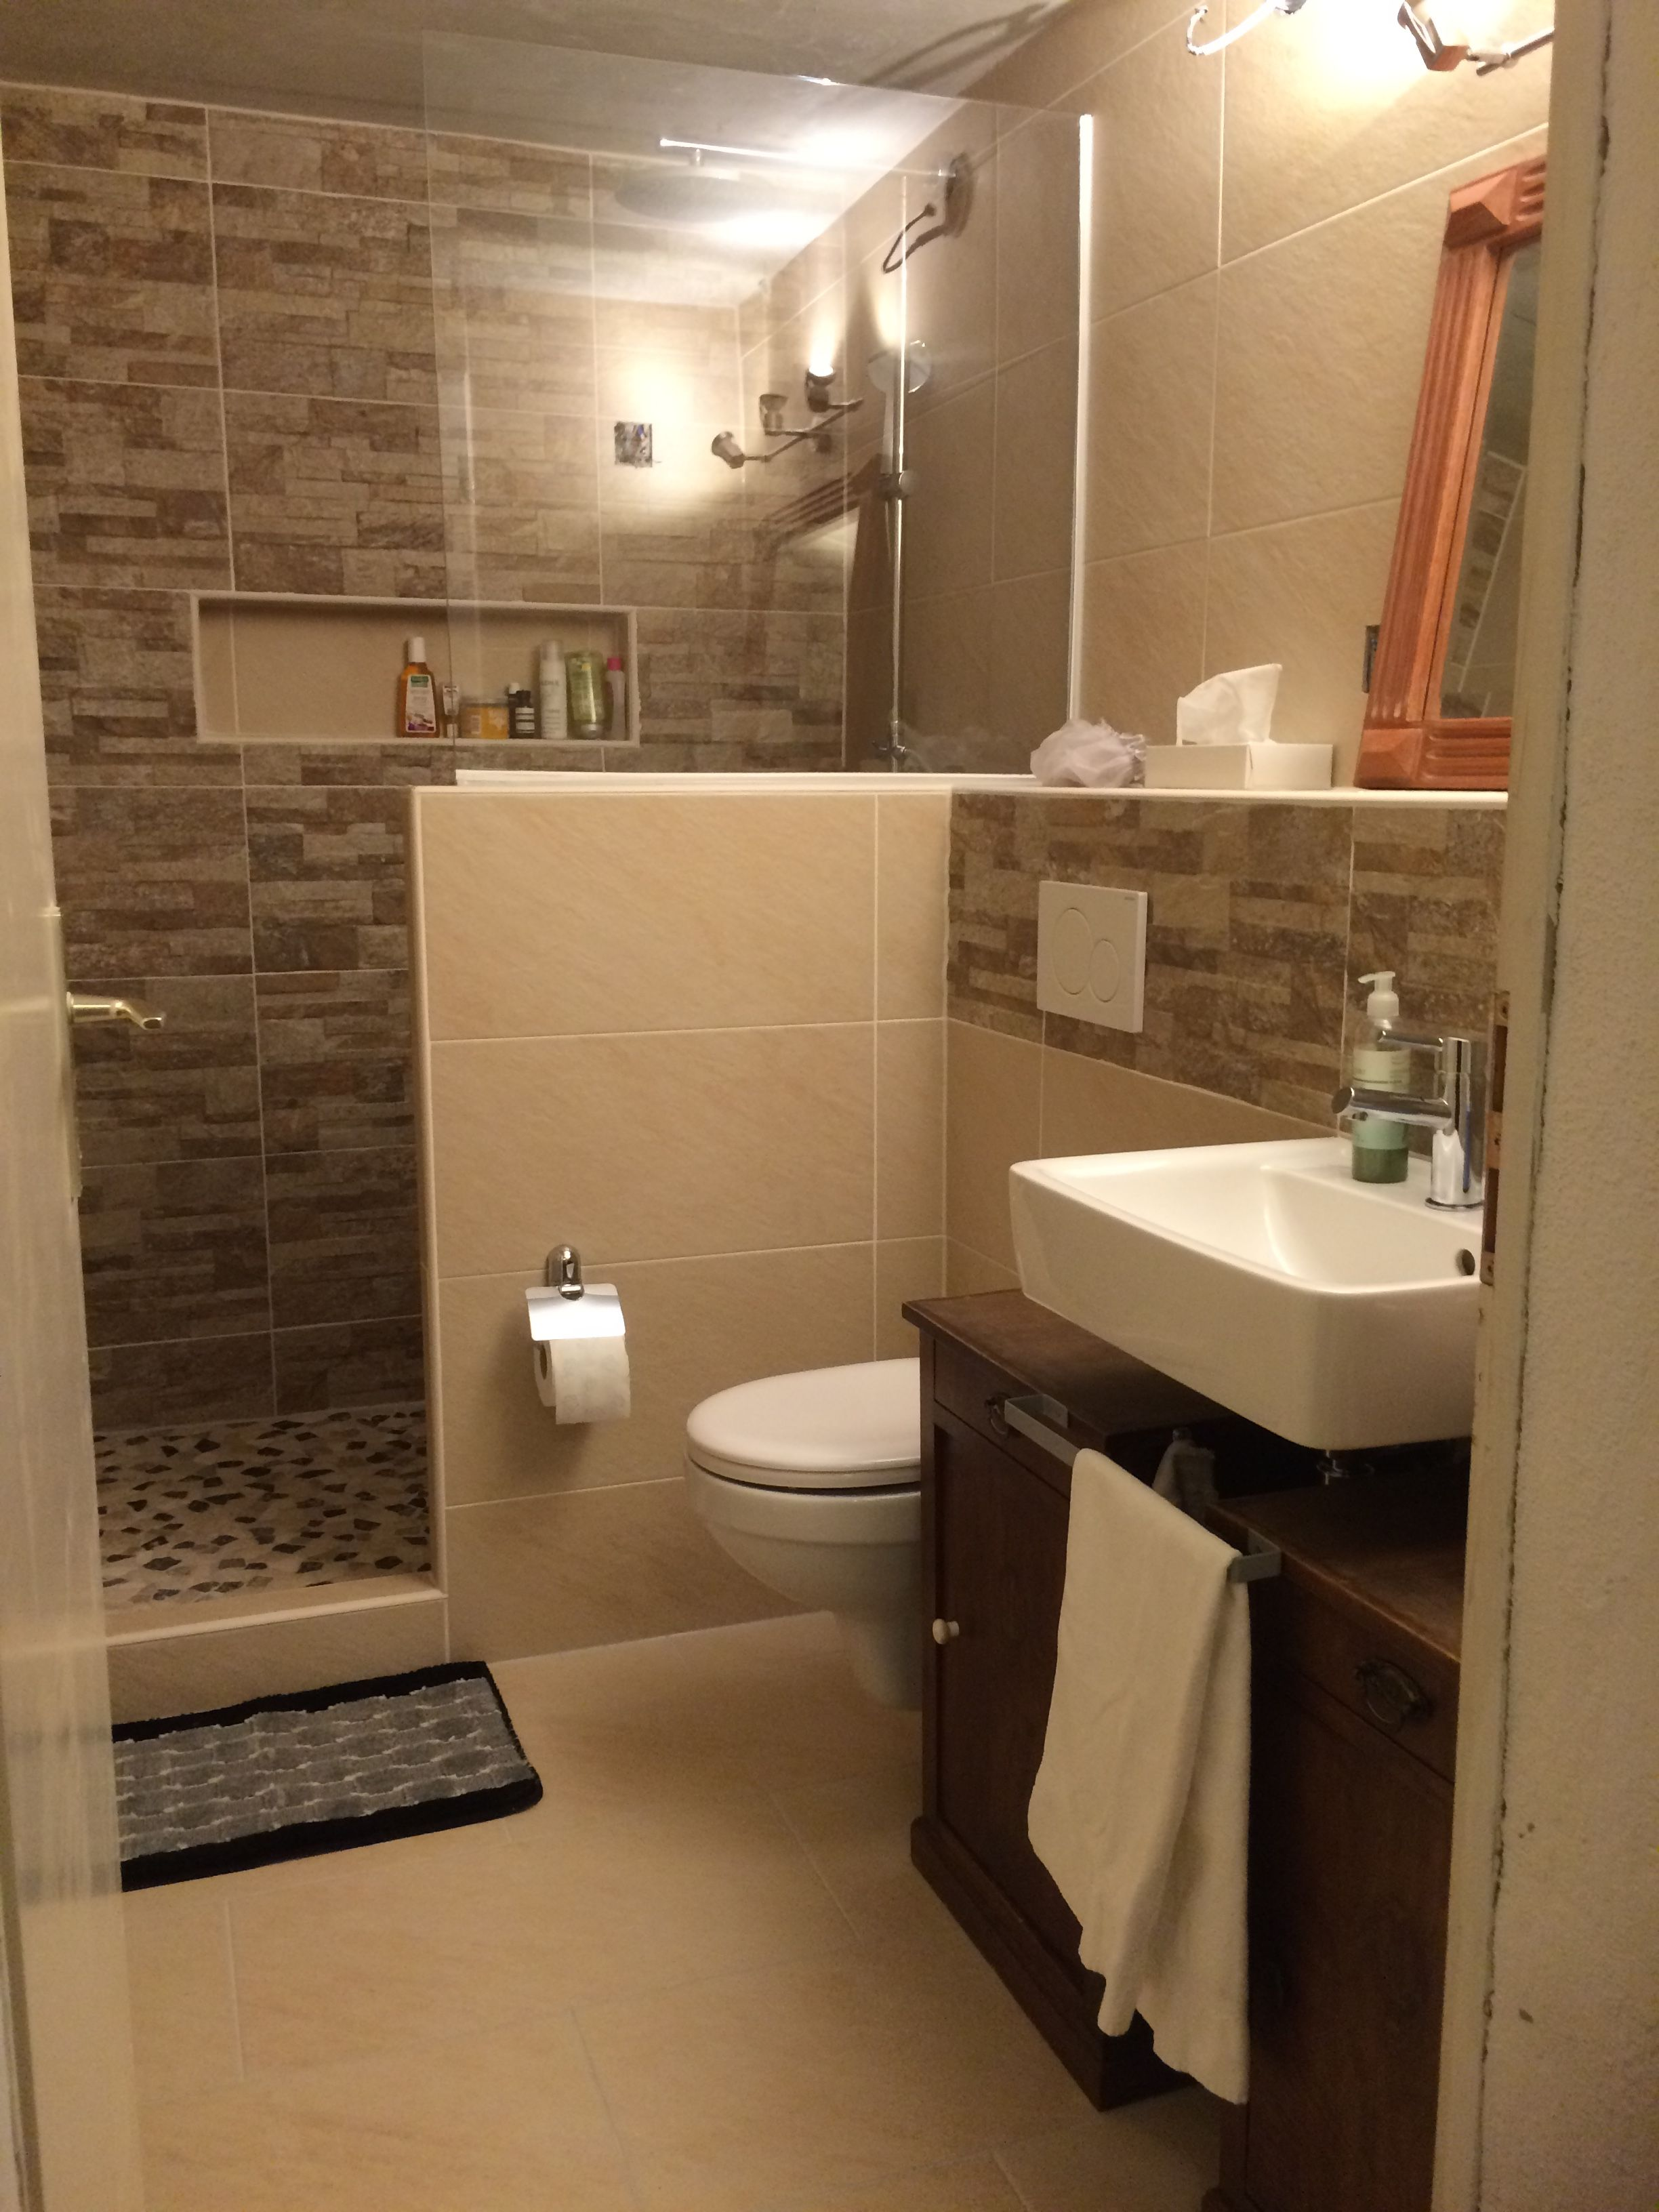 Small Bathroom Designs India Photos Design Ideas The Best Small And Functional Bathroom Design As Everys Bathroom Tile Designs Bathroom Layout Washroom Design